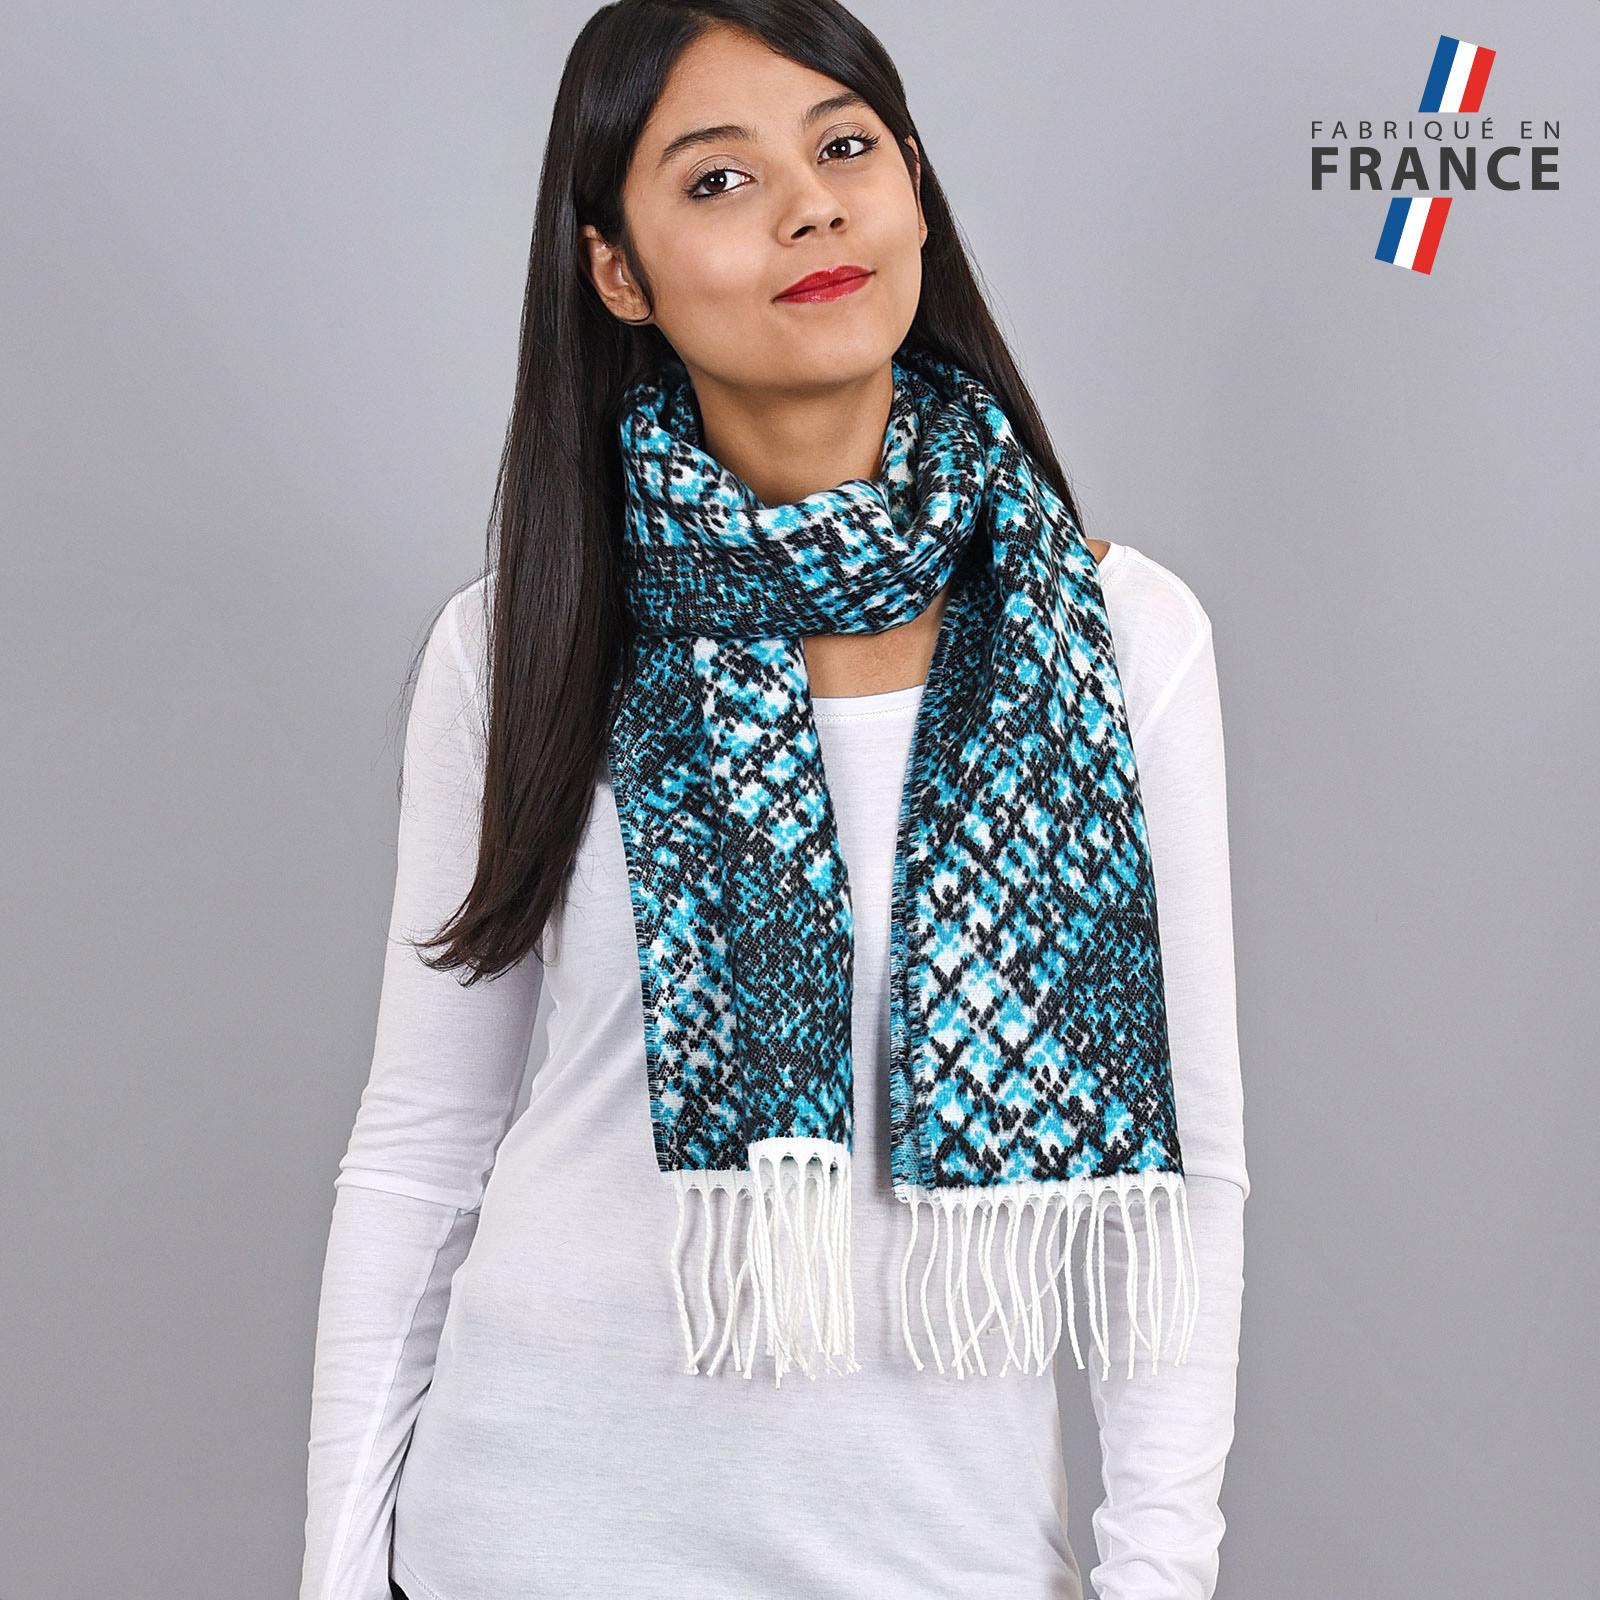 AT-03945-VF16-FR-echarpe-femme-bleu-degrade